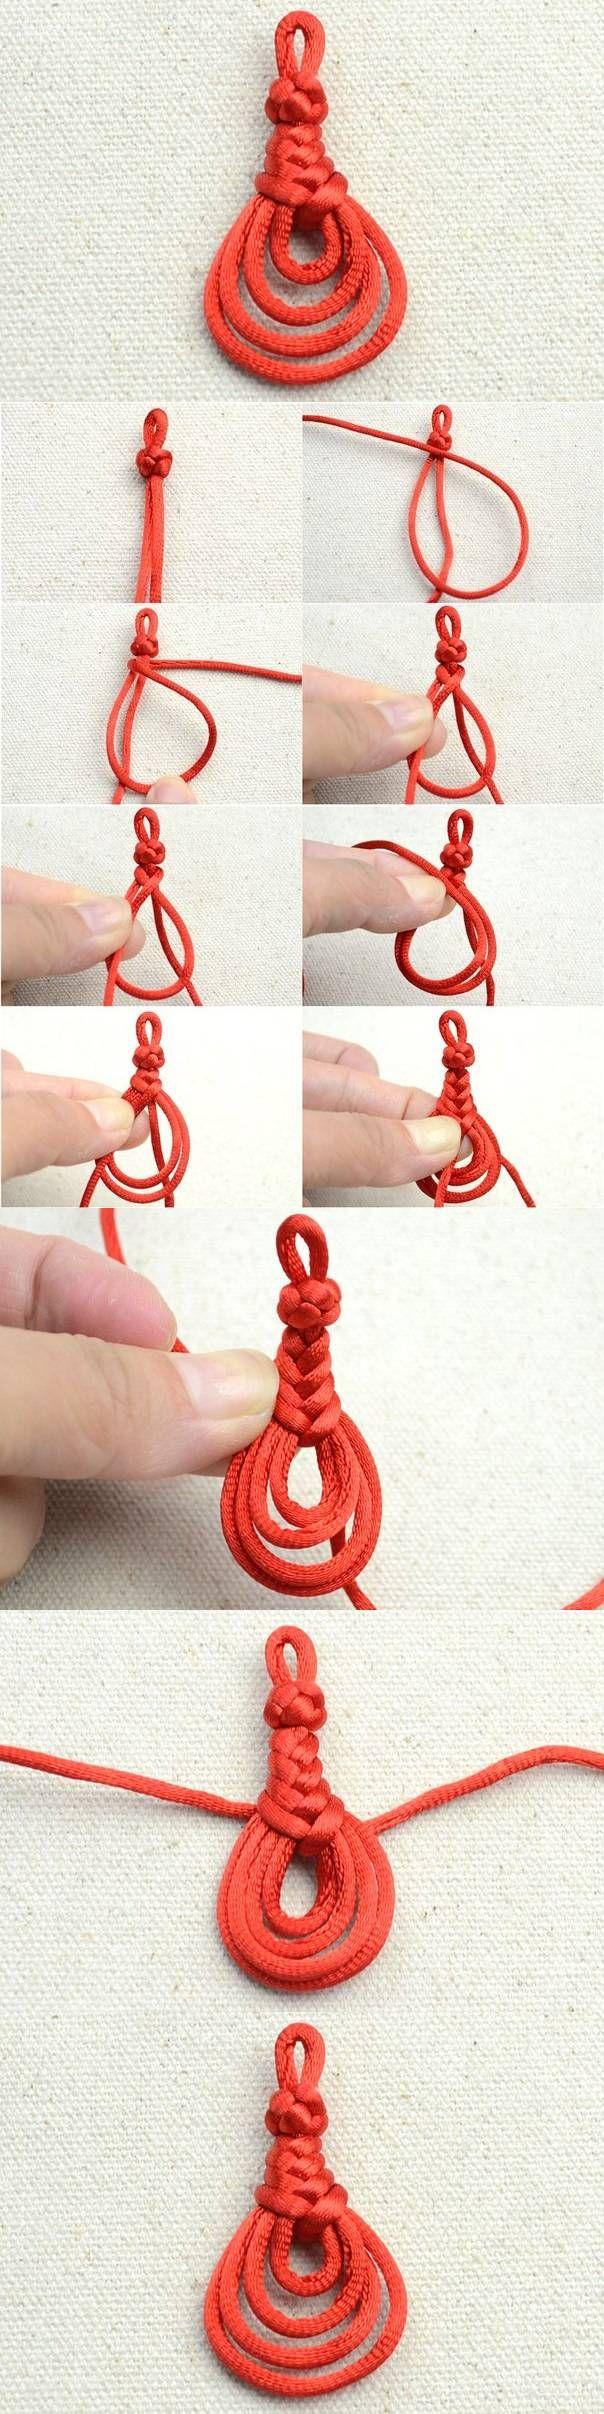 DIY Cute Knot Pendant Internet Tutorial